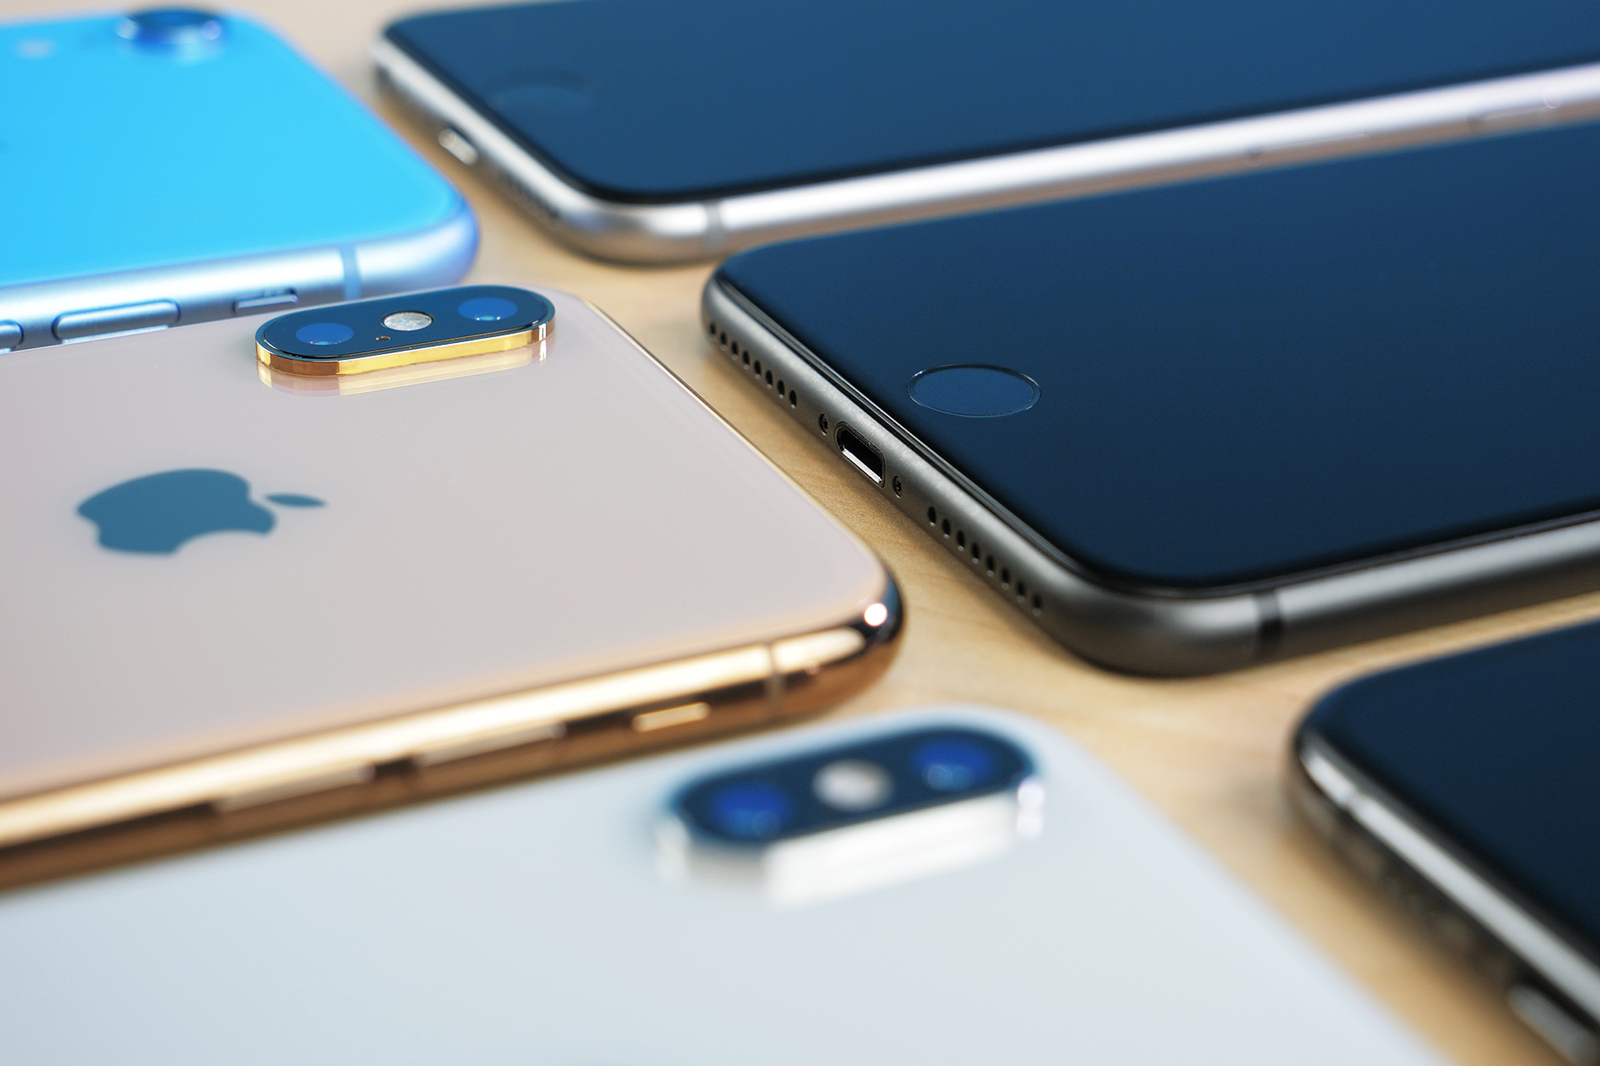 iPhone refurbished keurmerk smartphone tweedehands FixjeiPhone